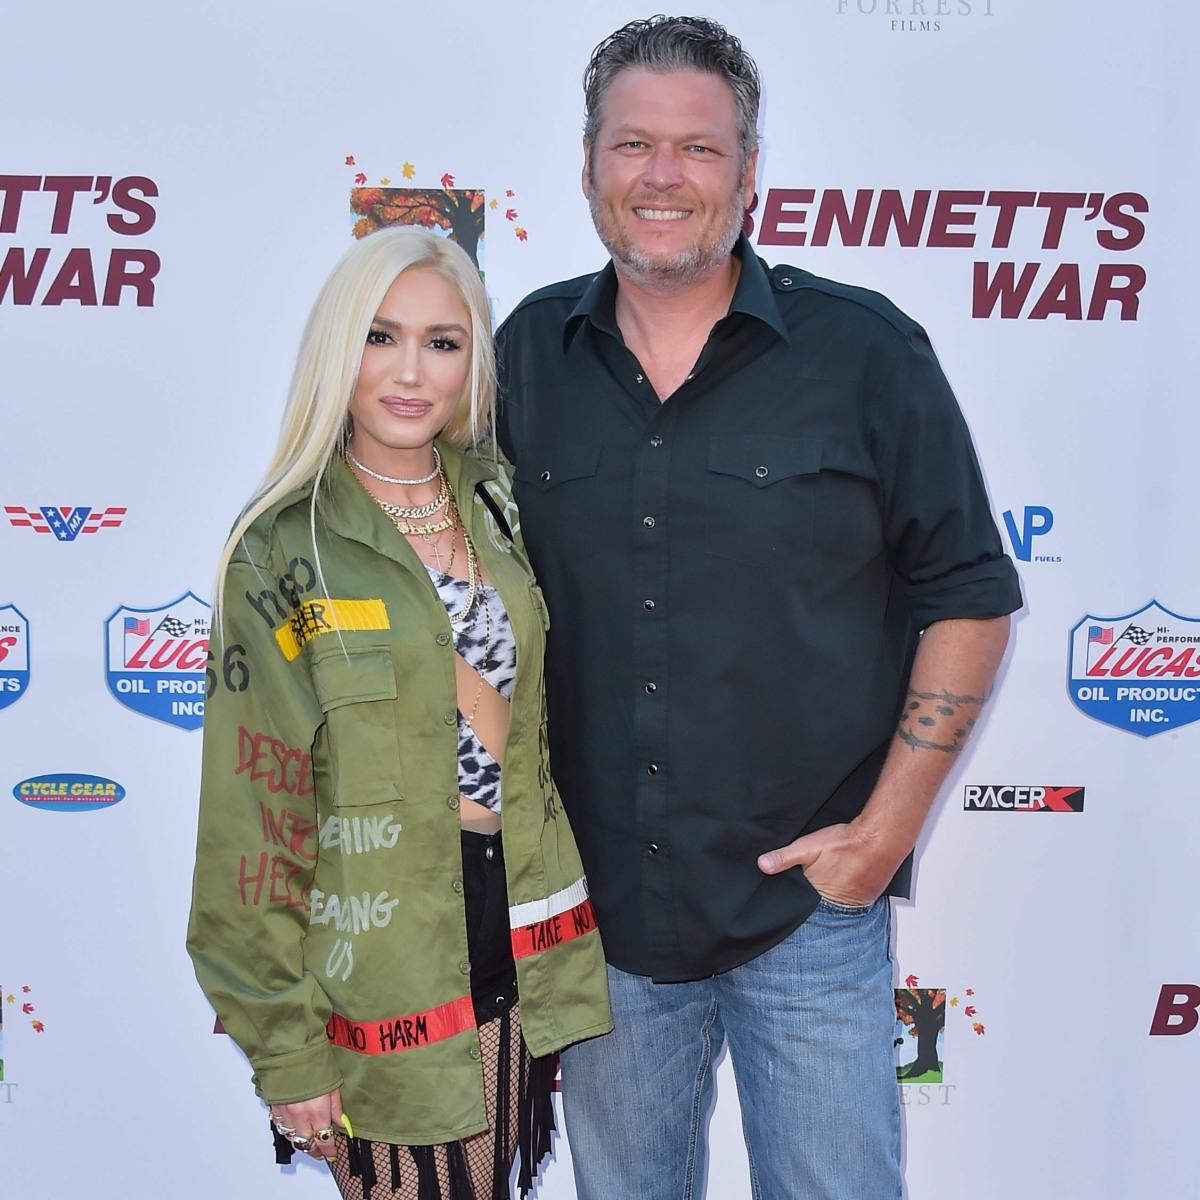 Singer Gwen Stefani and boyfriend/singer Blake Shelton arrive at the Los Angeles Premiere Of Forrest Films' 'Bennett's War' held at the Steven J. Ross Theater at Warner Bros. Studios on August 13, 2019 in Burbank, Los Angeles, California, United States. (